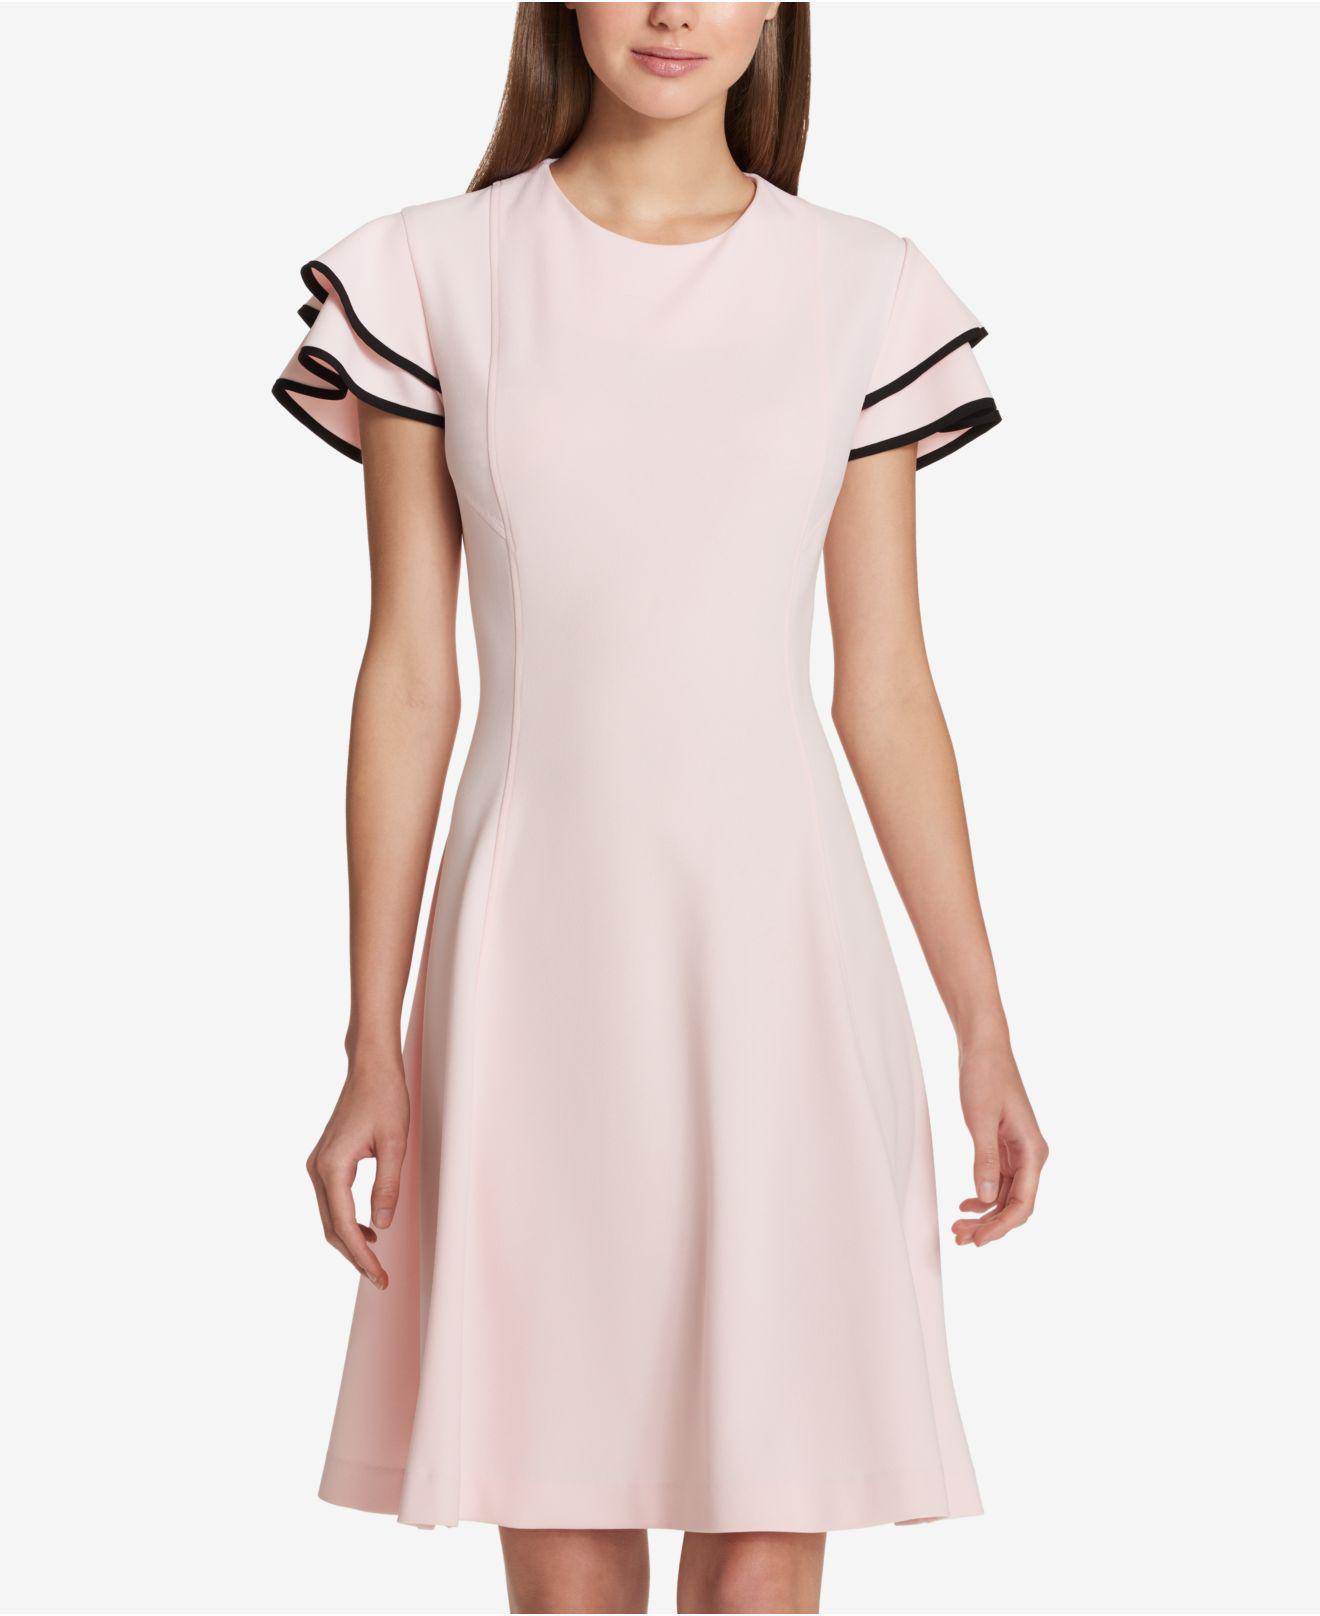 9bfbea88 Tommy Hilfiger Flutter-sleeve Fit & Flare Dress in Pink - Lyst